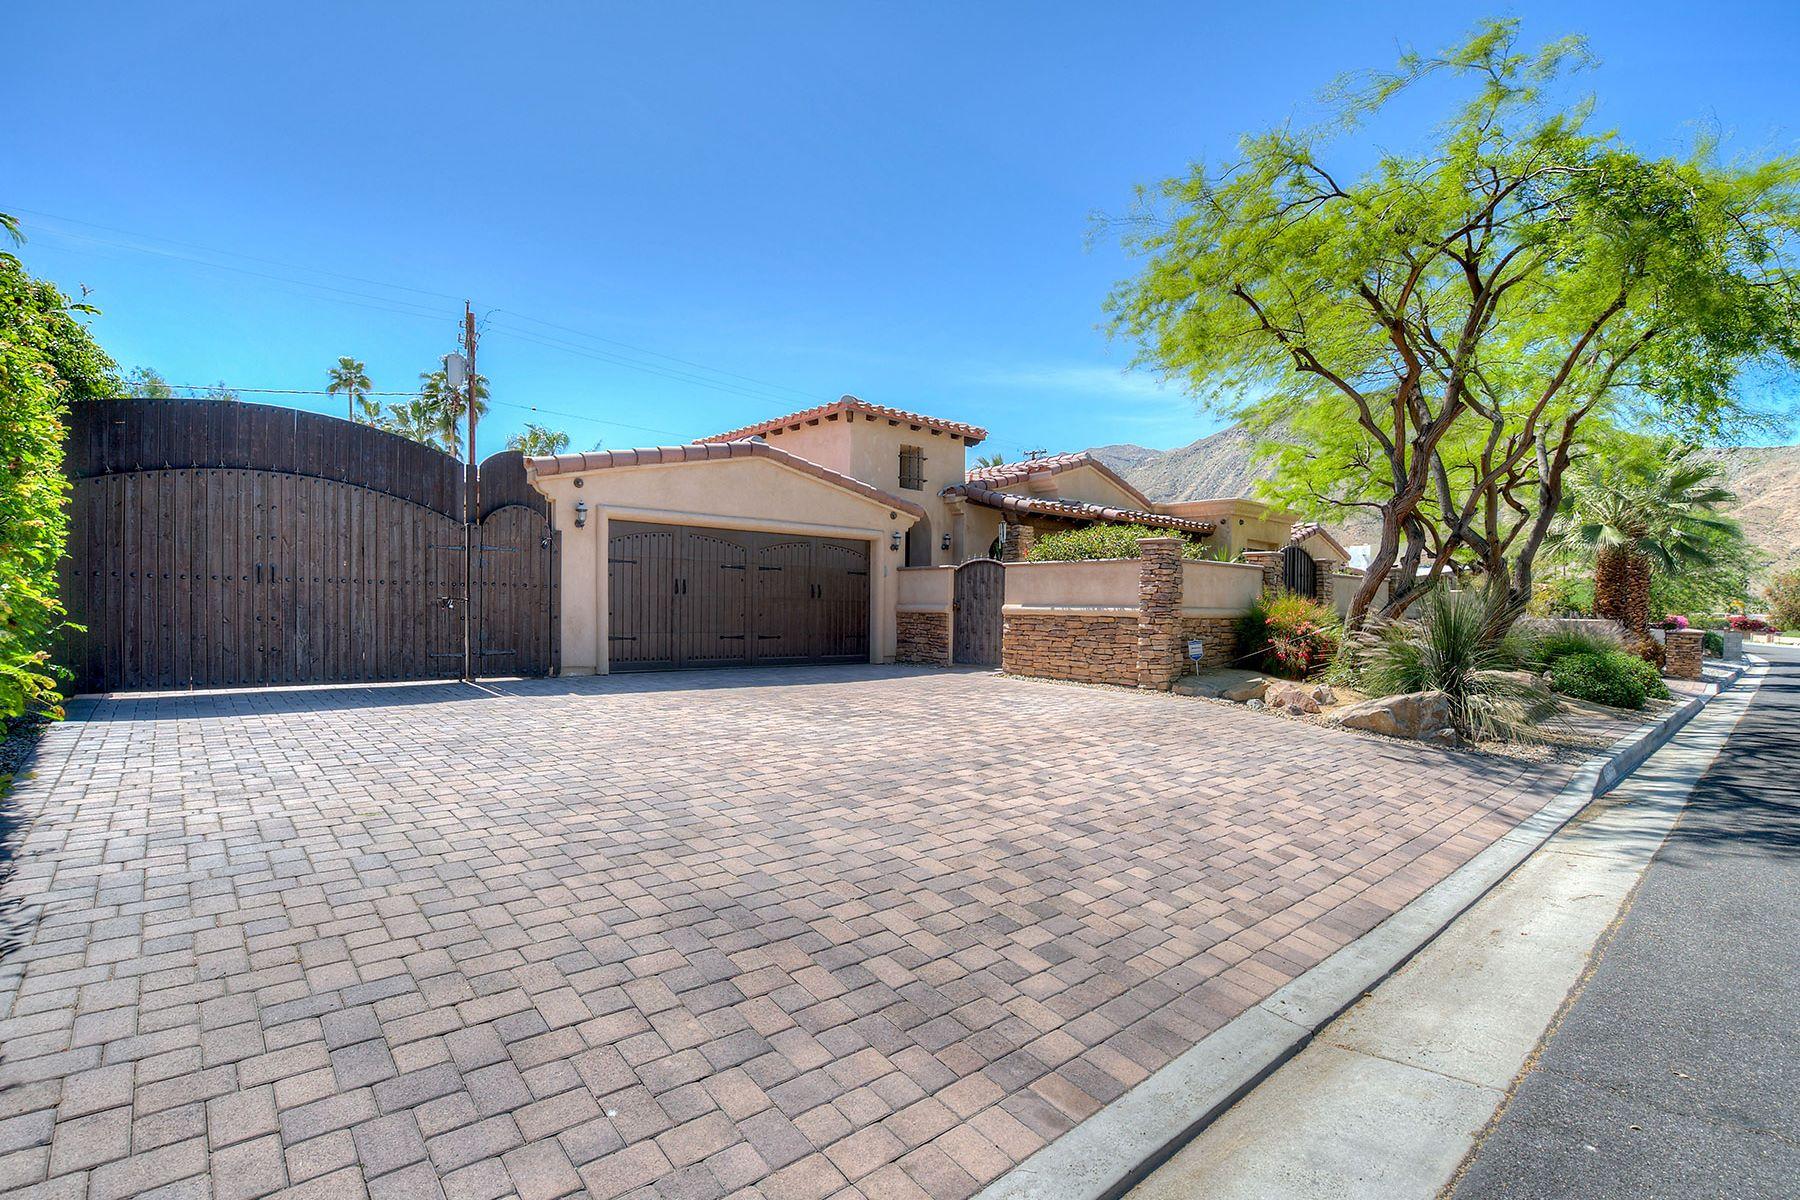 Single Family Home for Sale at 72775 Beavertail Street Palm Desert, California 92260 United States